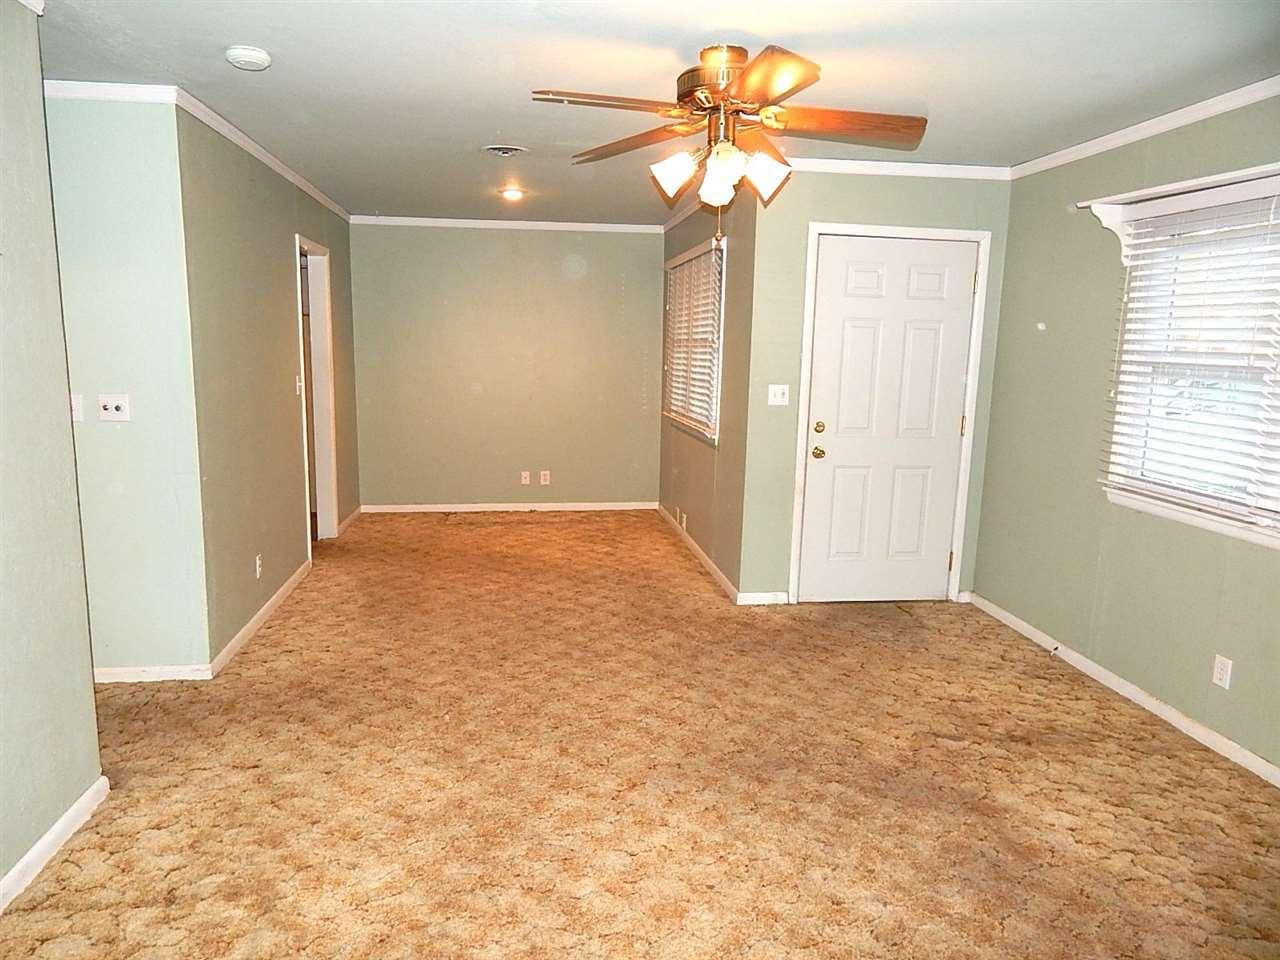 Sold Intraoffice W/MLS | 2226 Garden Ponca City, OK 74601 1